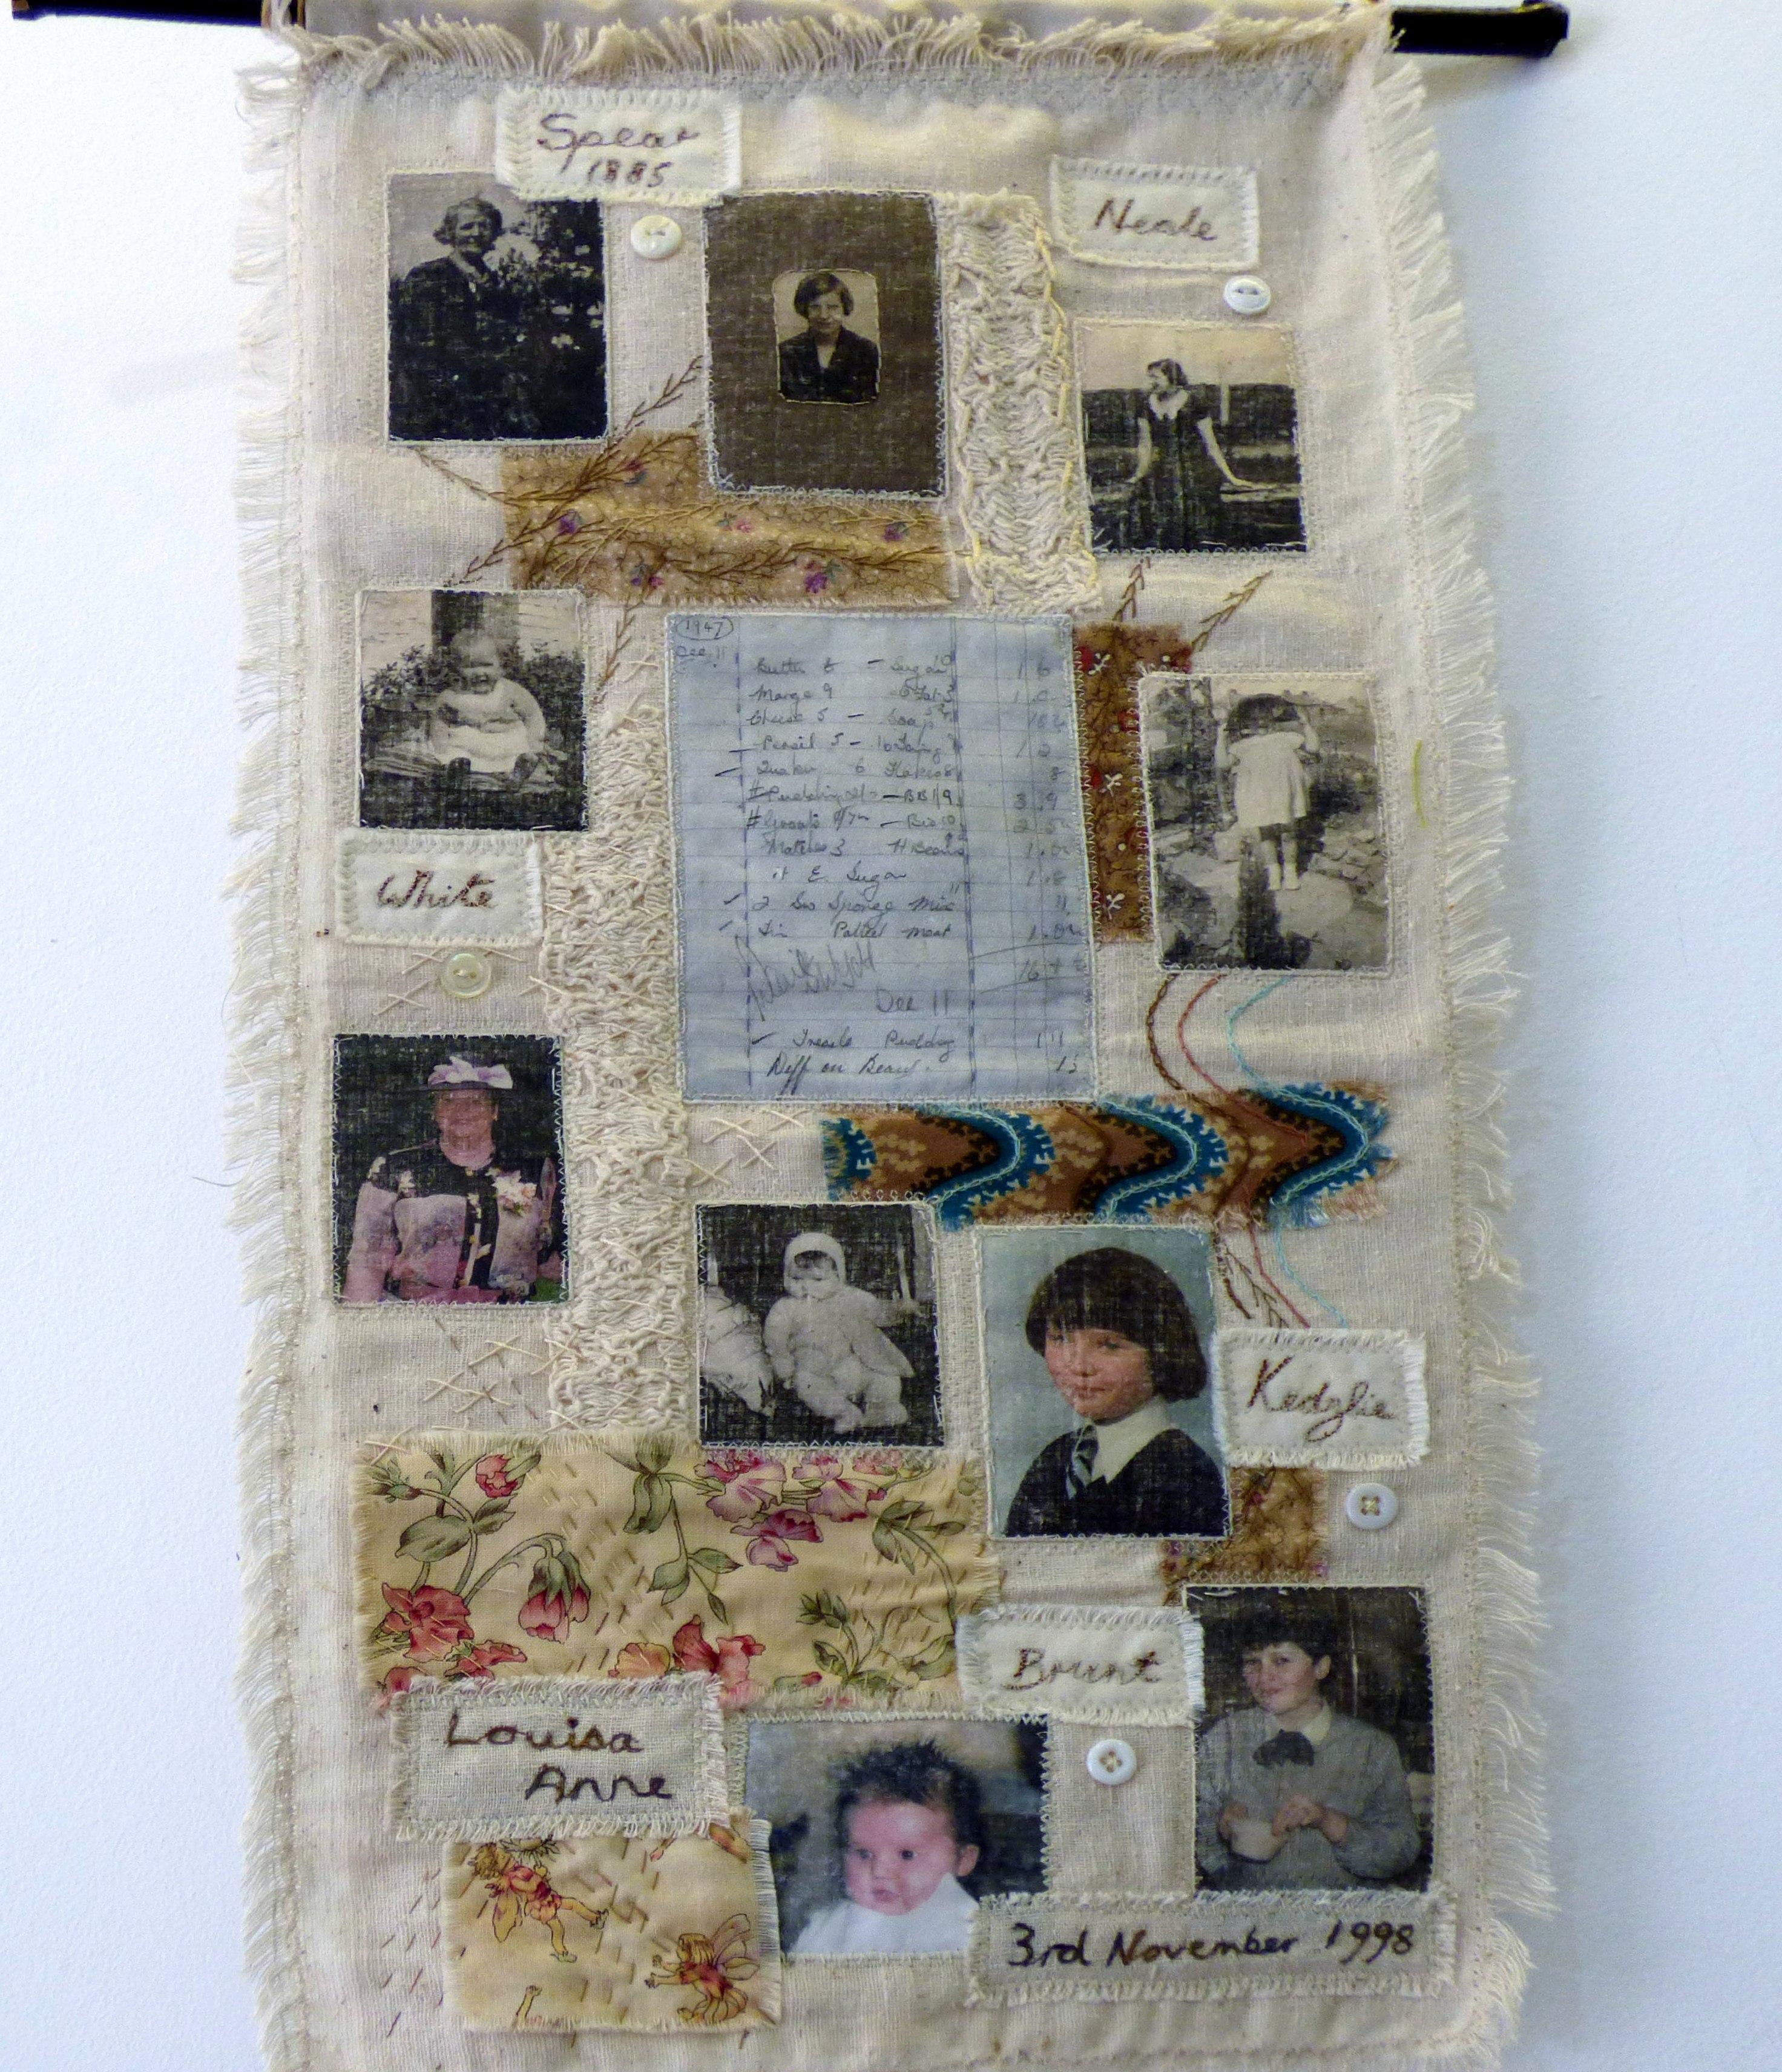 FIVE GENERATIONS by Sandra Kedzlie, Parbold EG